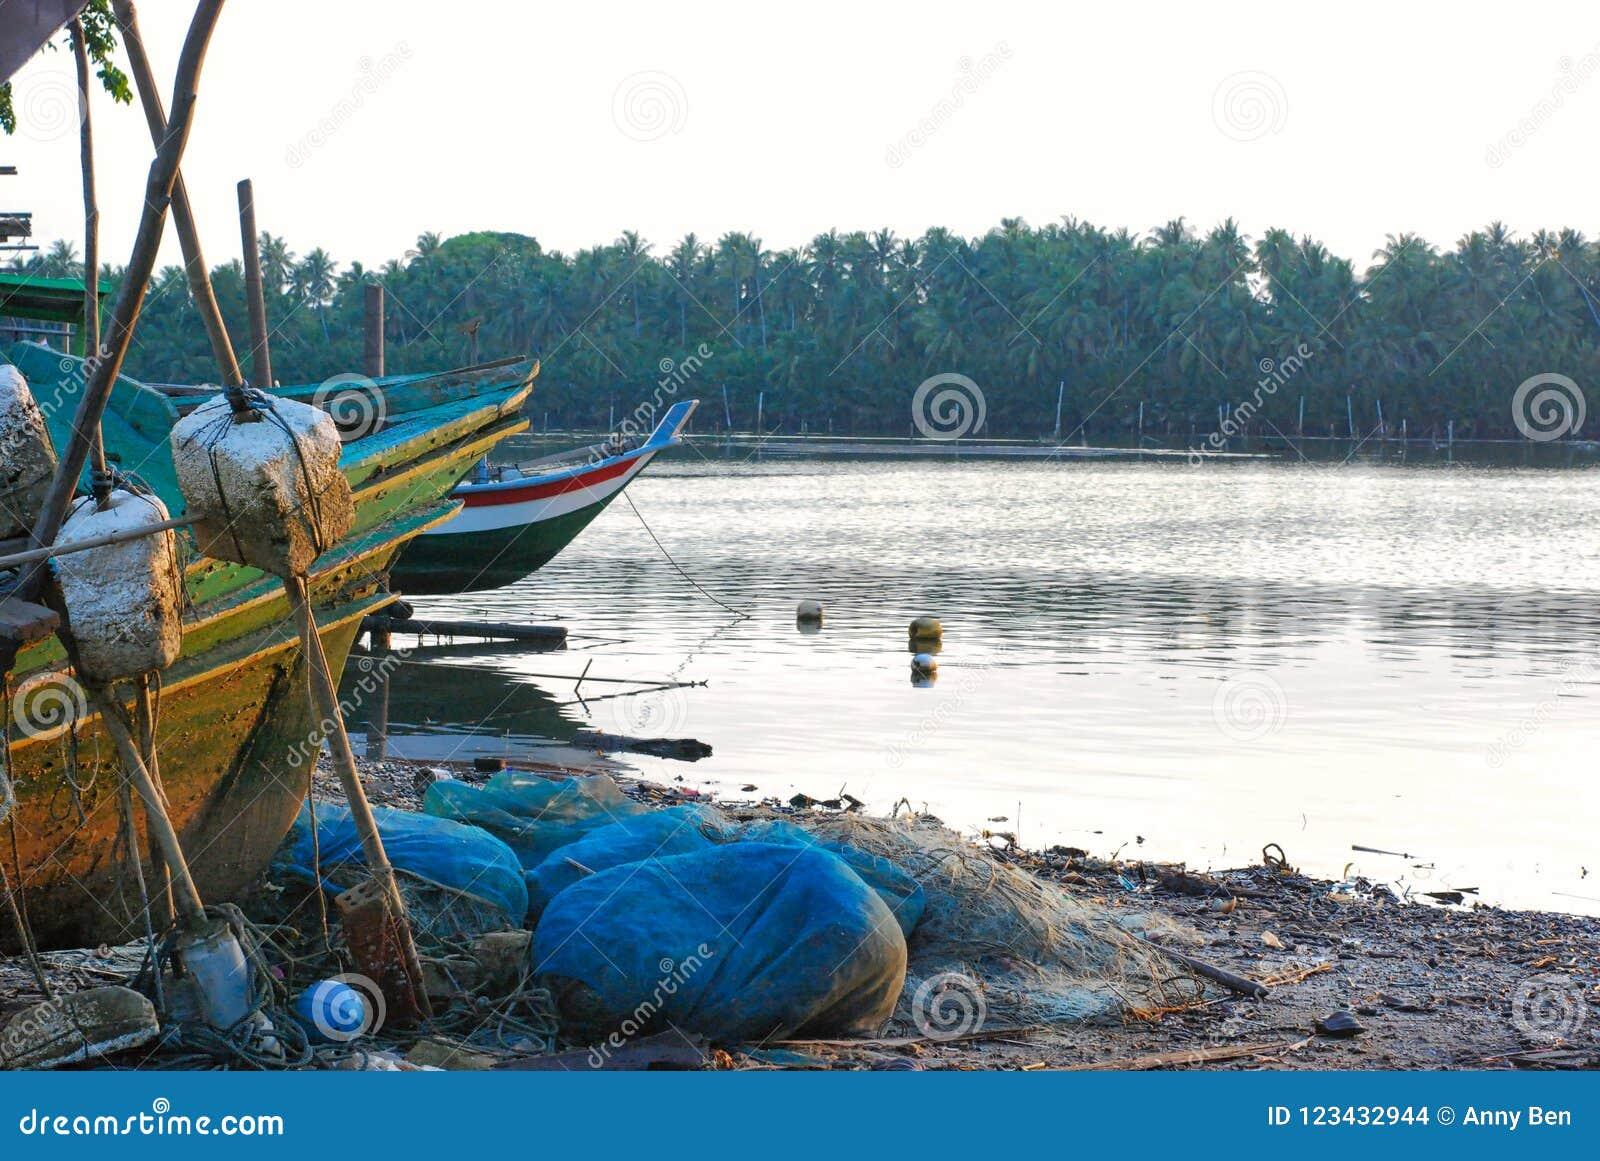 Shipwrecks at riverside